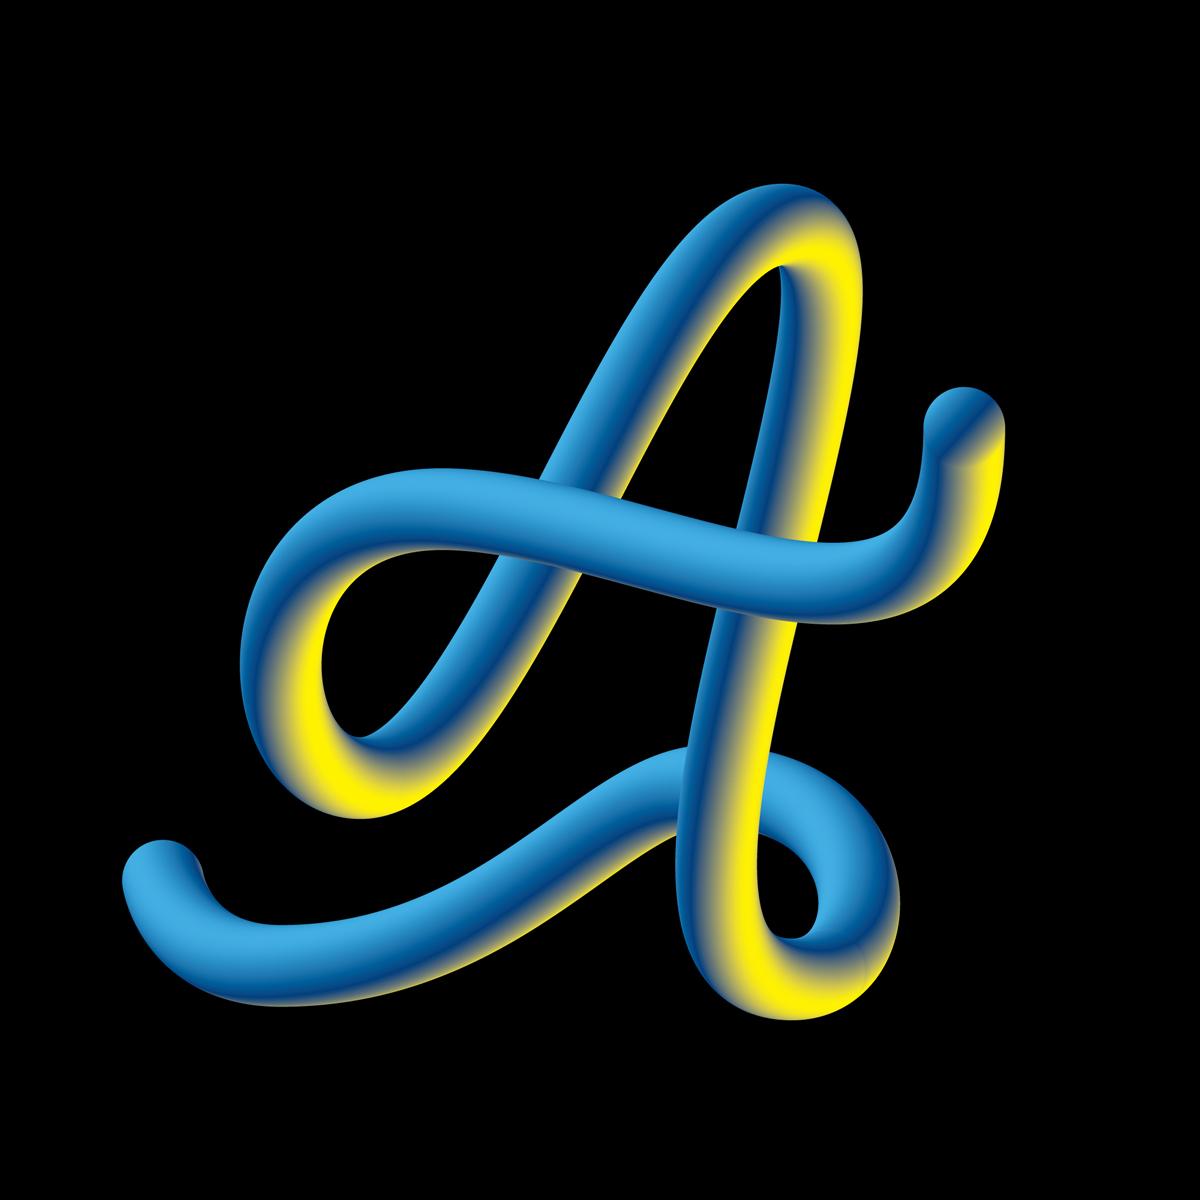 Hand Lettering Alphabet - Letter A